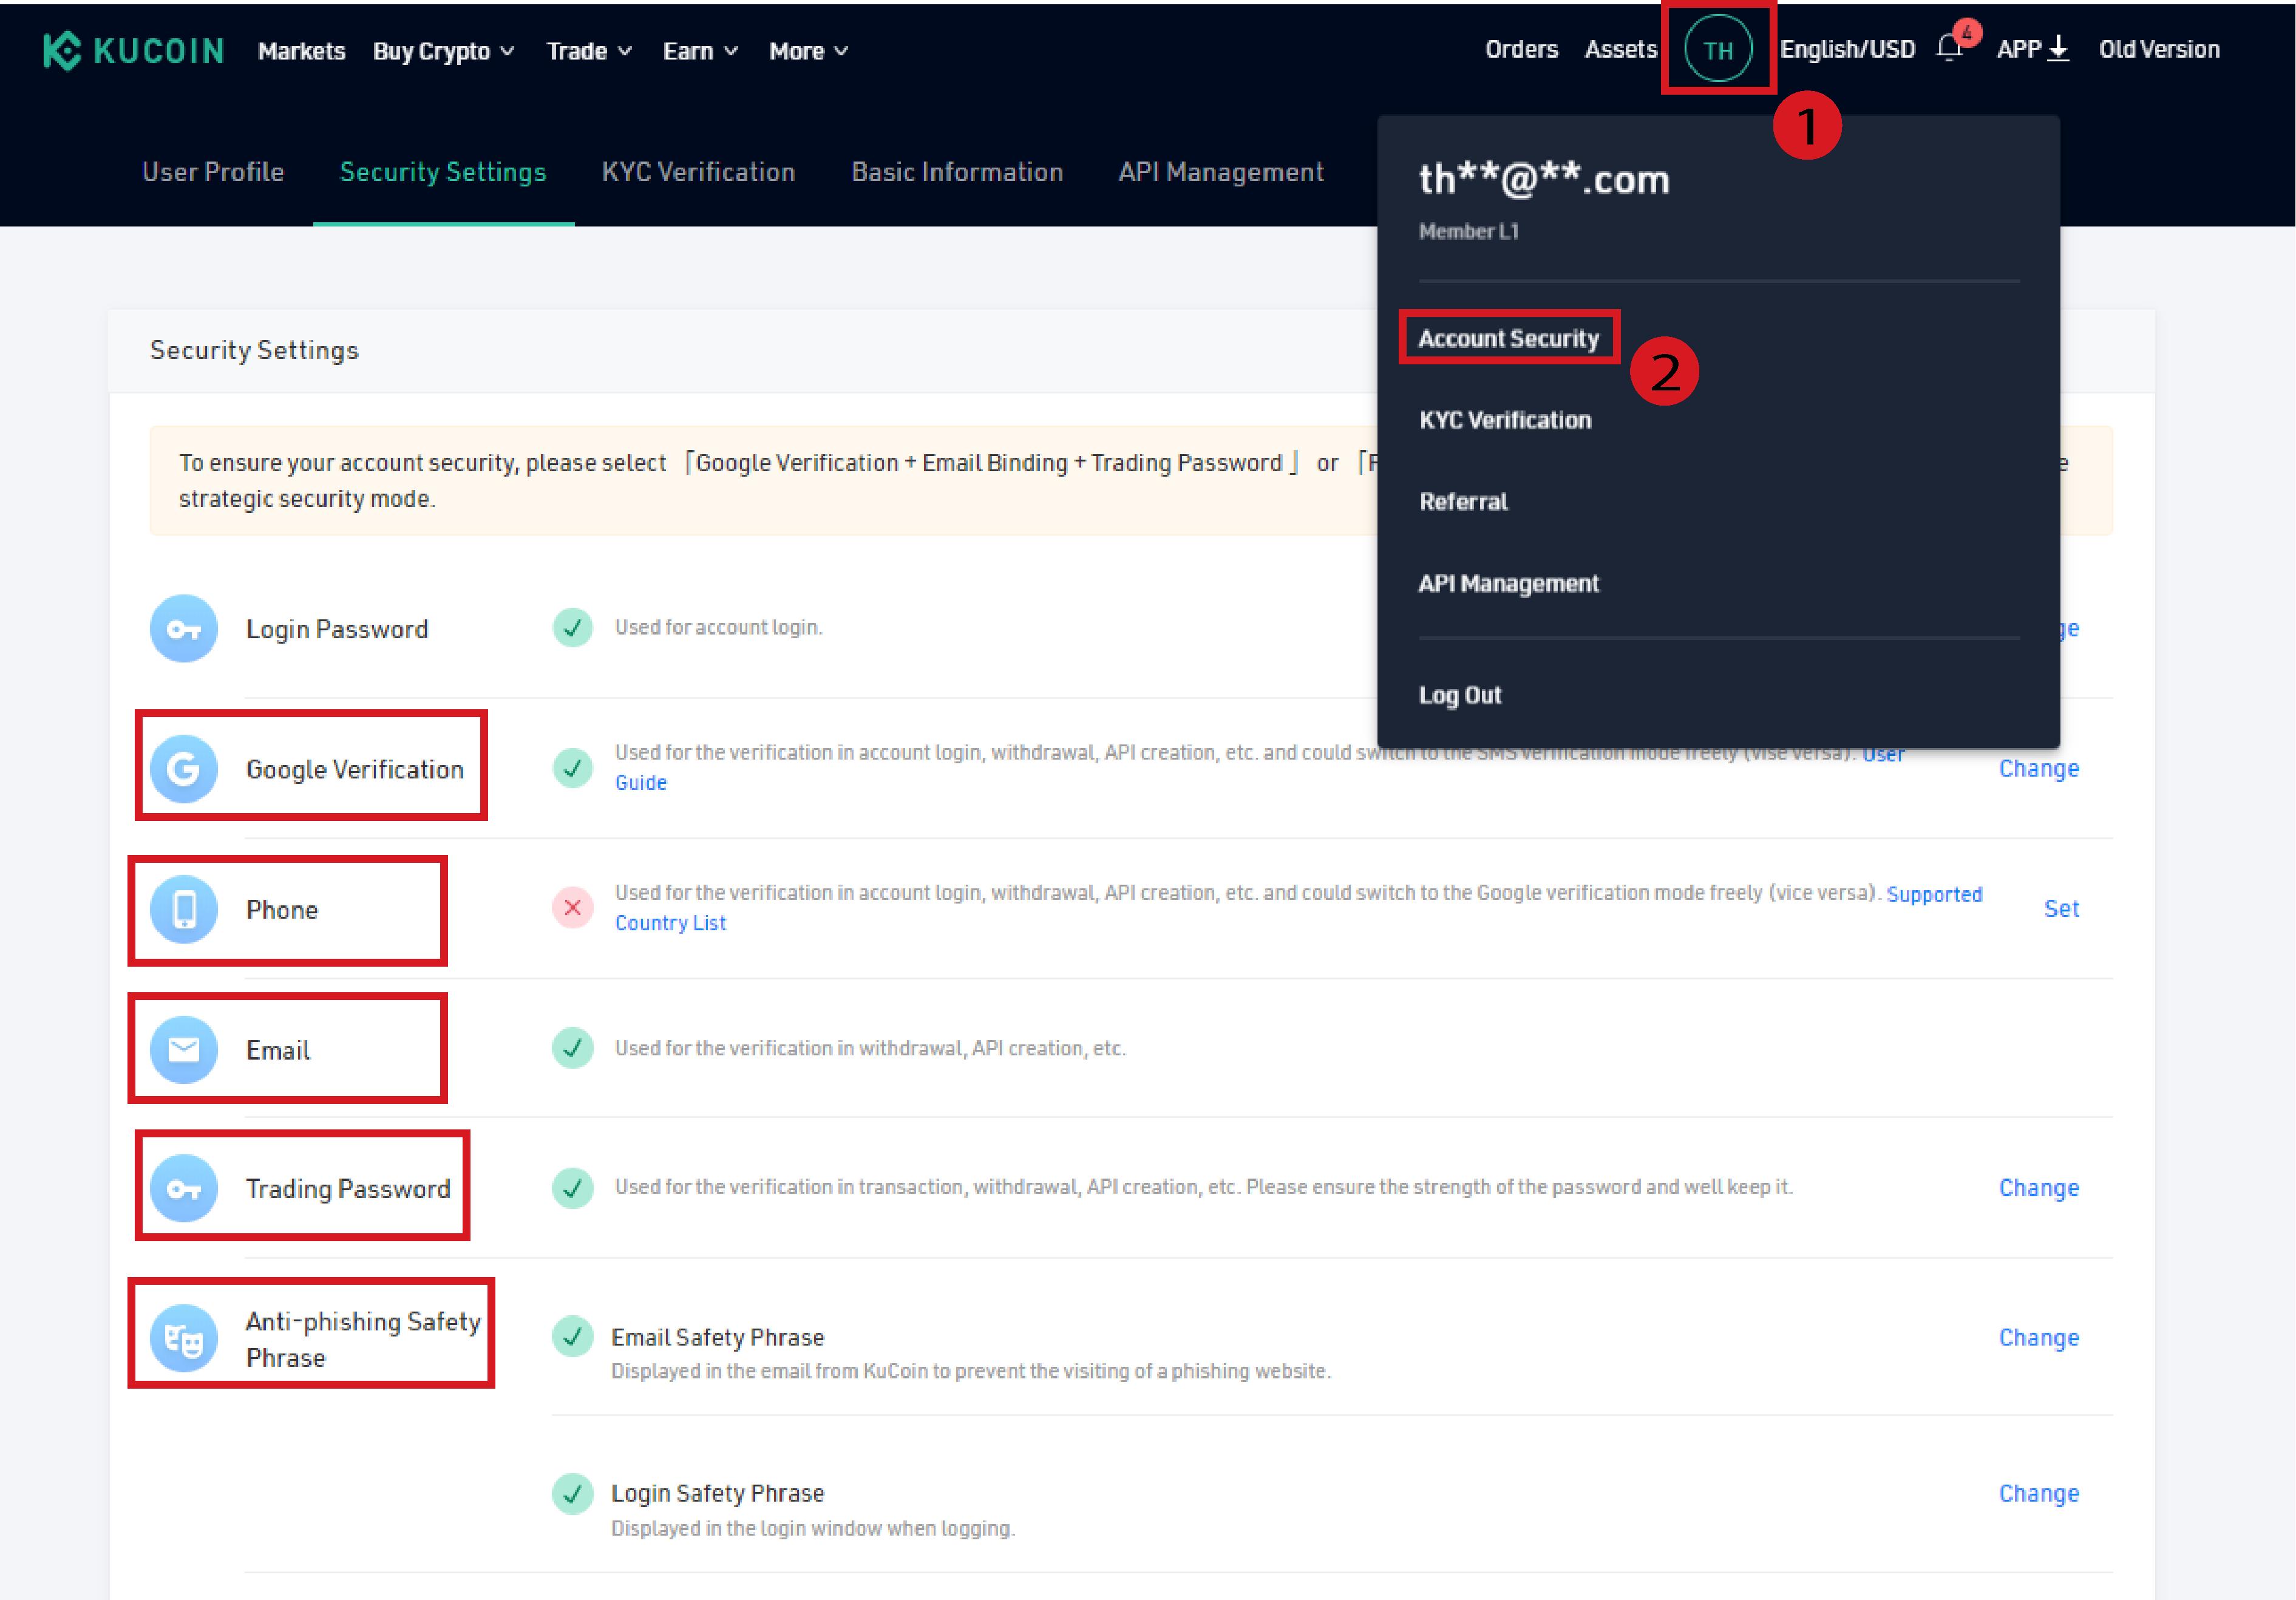 kucoin security options